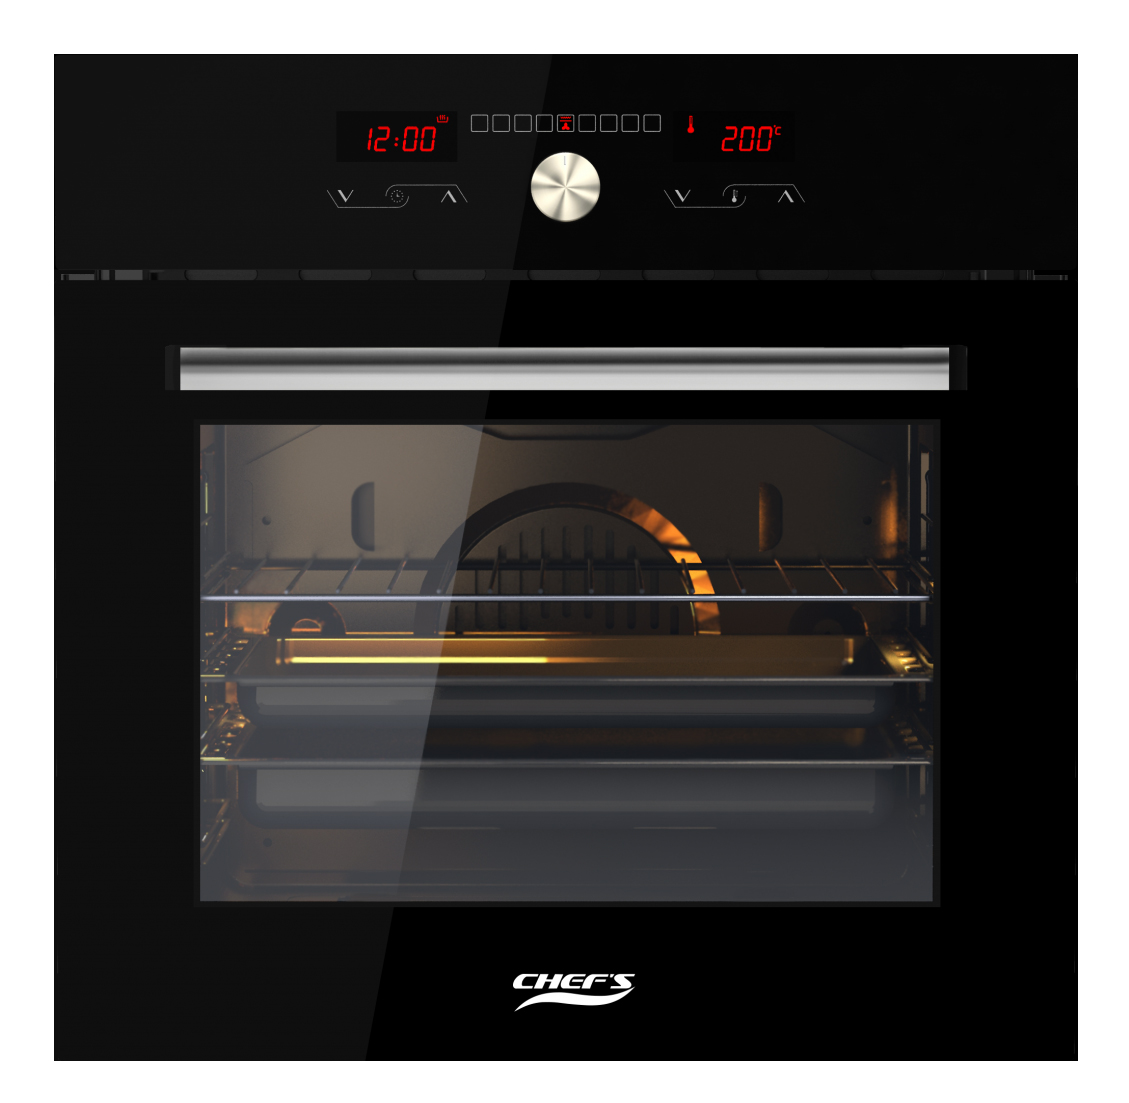 lo-nuong-am-tu-chefs-eh-bo9090b-dung-tich-56-lit-1-25052019170016-96.jpg